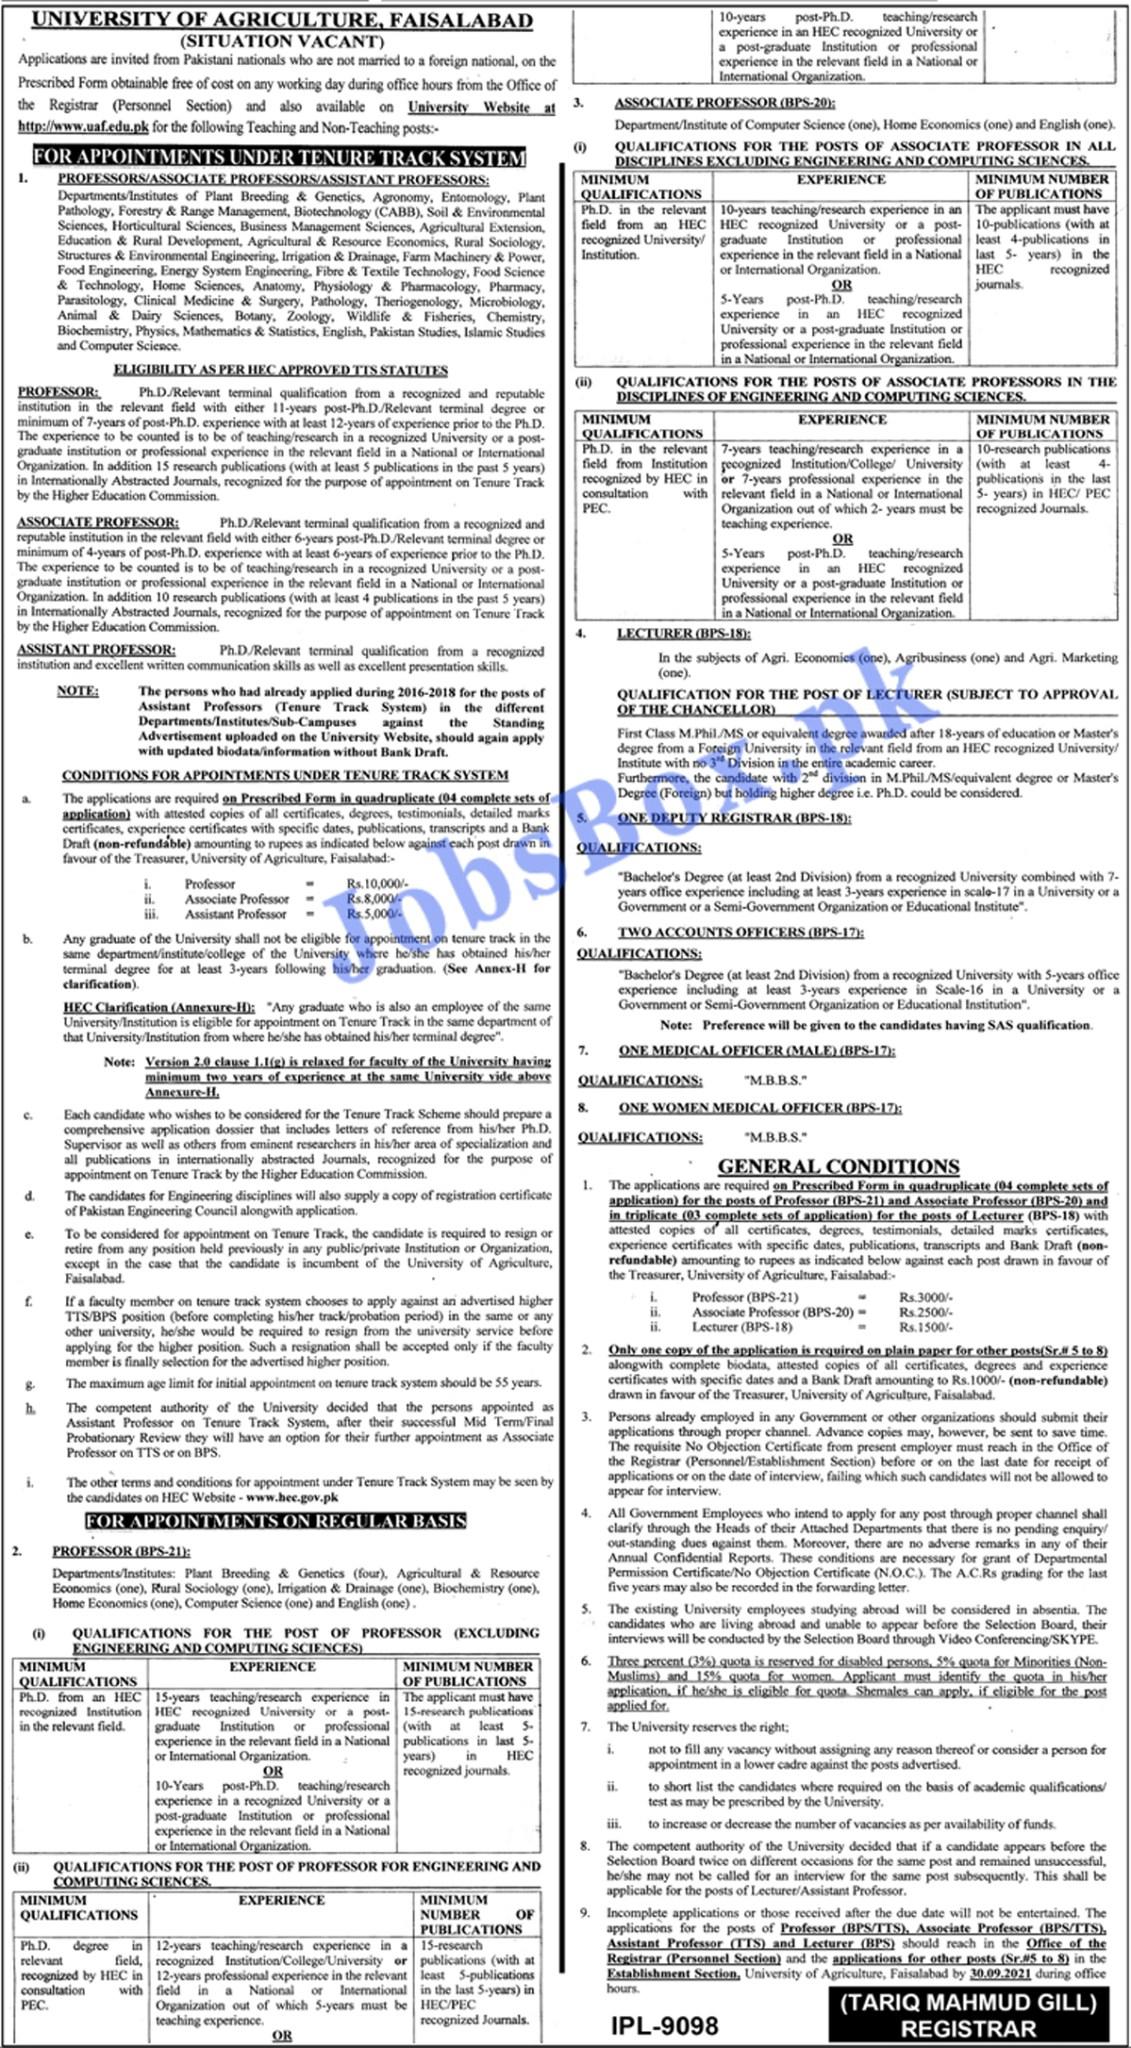 University of Agriculture Faisalabad Jobs 2021 – UAF Jobs www.uaf.edu.pk